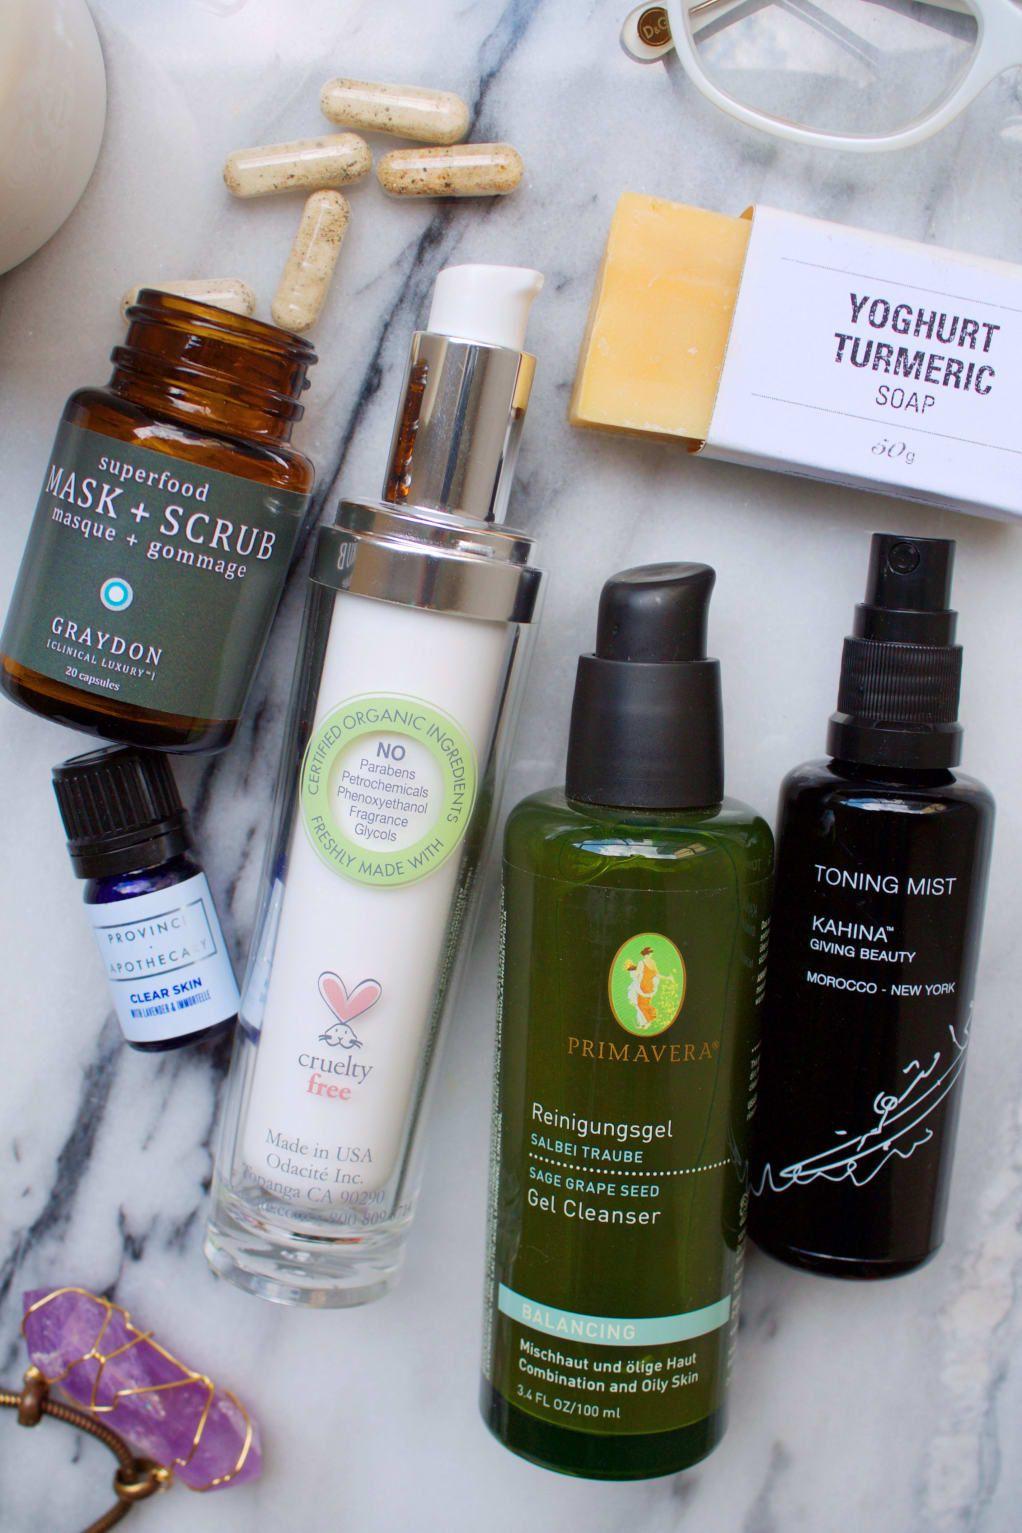 Best Natural Face Moisturizer Cream For Acne Prone Skin And Oily Skin Moisturizer Be Best Natural Face Moisturizer Natural Face Moisturizer Acne Prone Skin